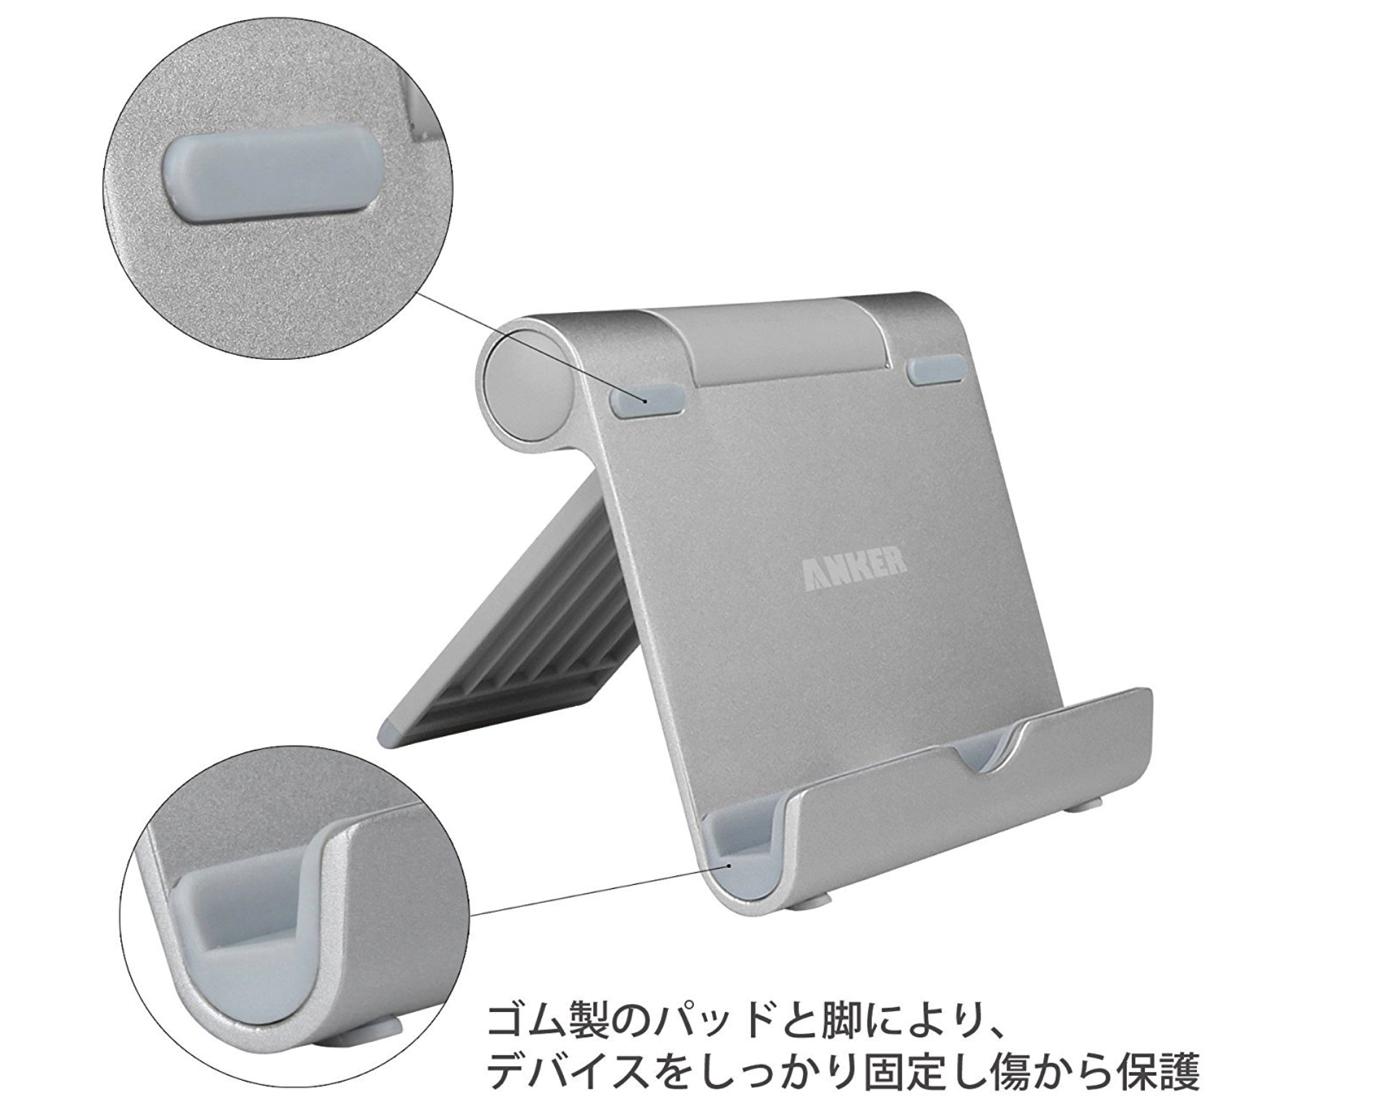 Anker タブレット用スタンド 角度調整可能 iPad・iPad mini・Nexus 7等 (シルバー)-5